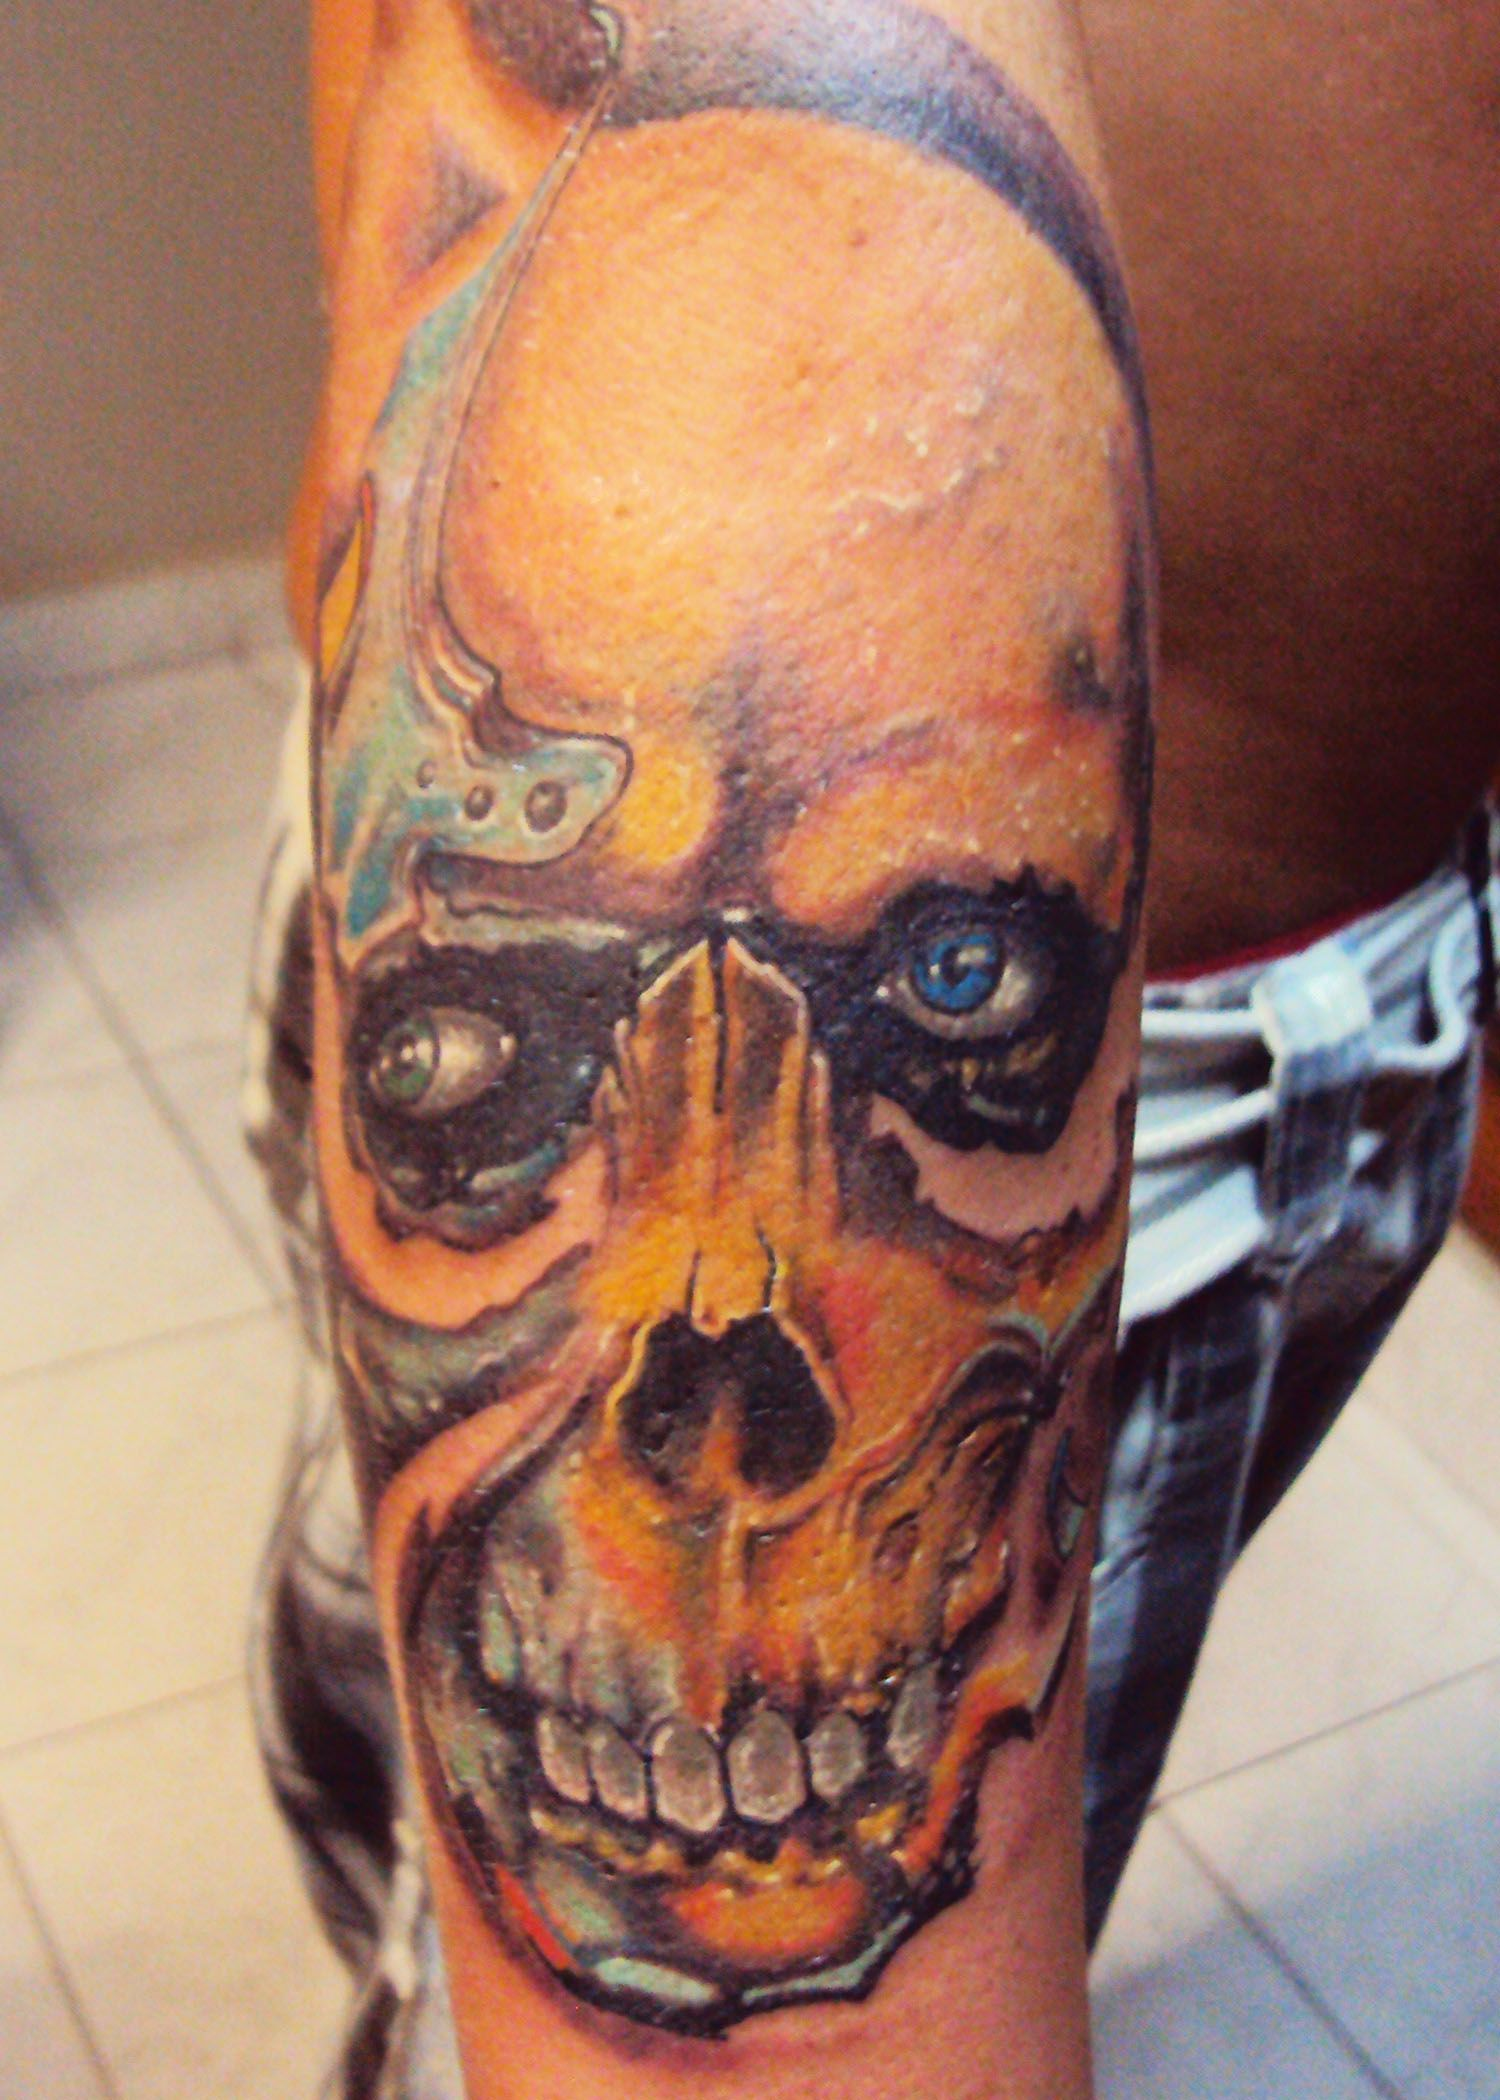 Skull Free Hand Gunn Art Tattoos Forearm Tattoos Y Zombie Tattoos